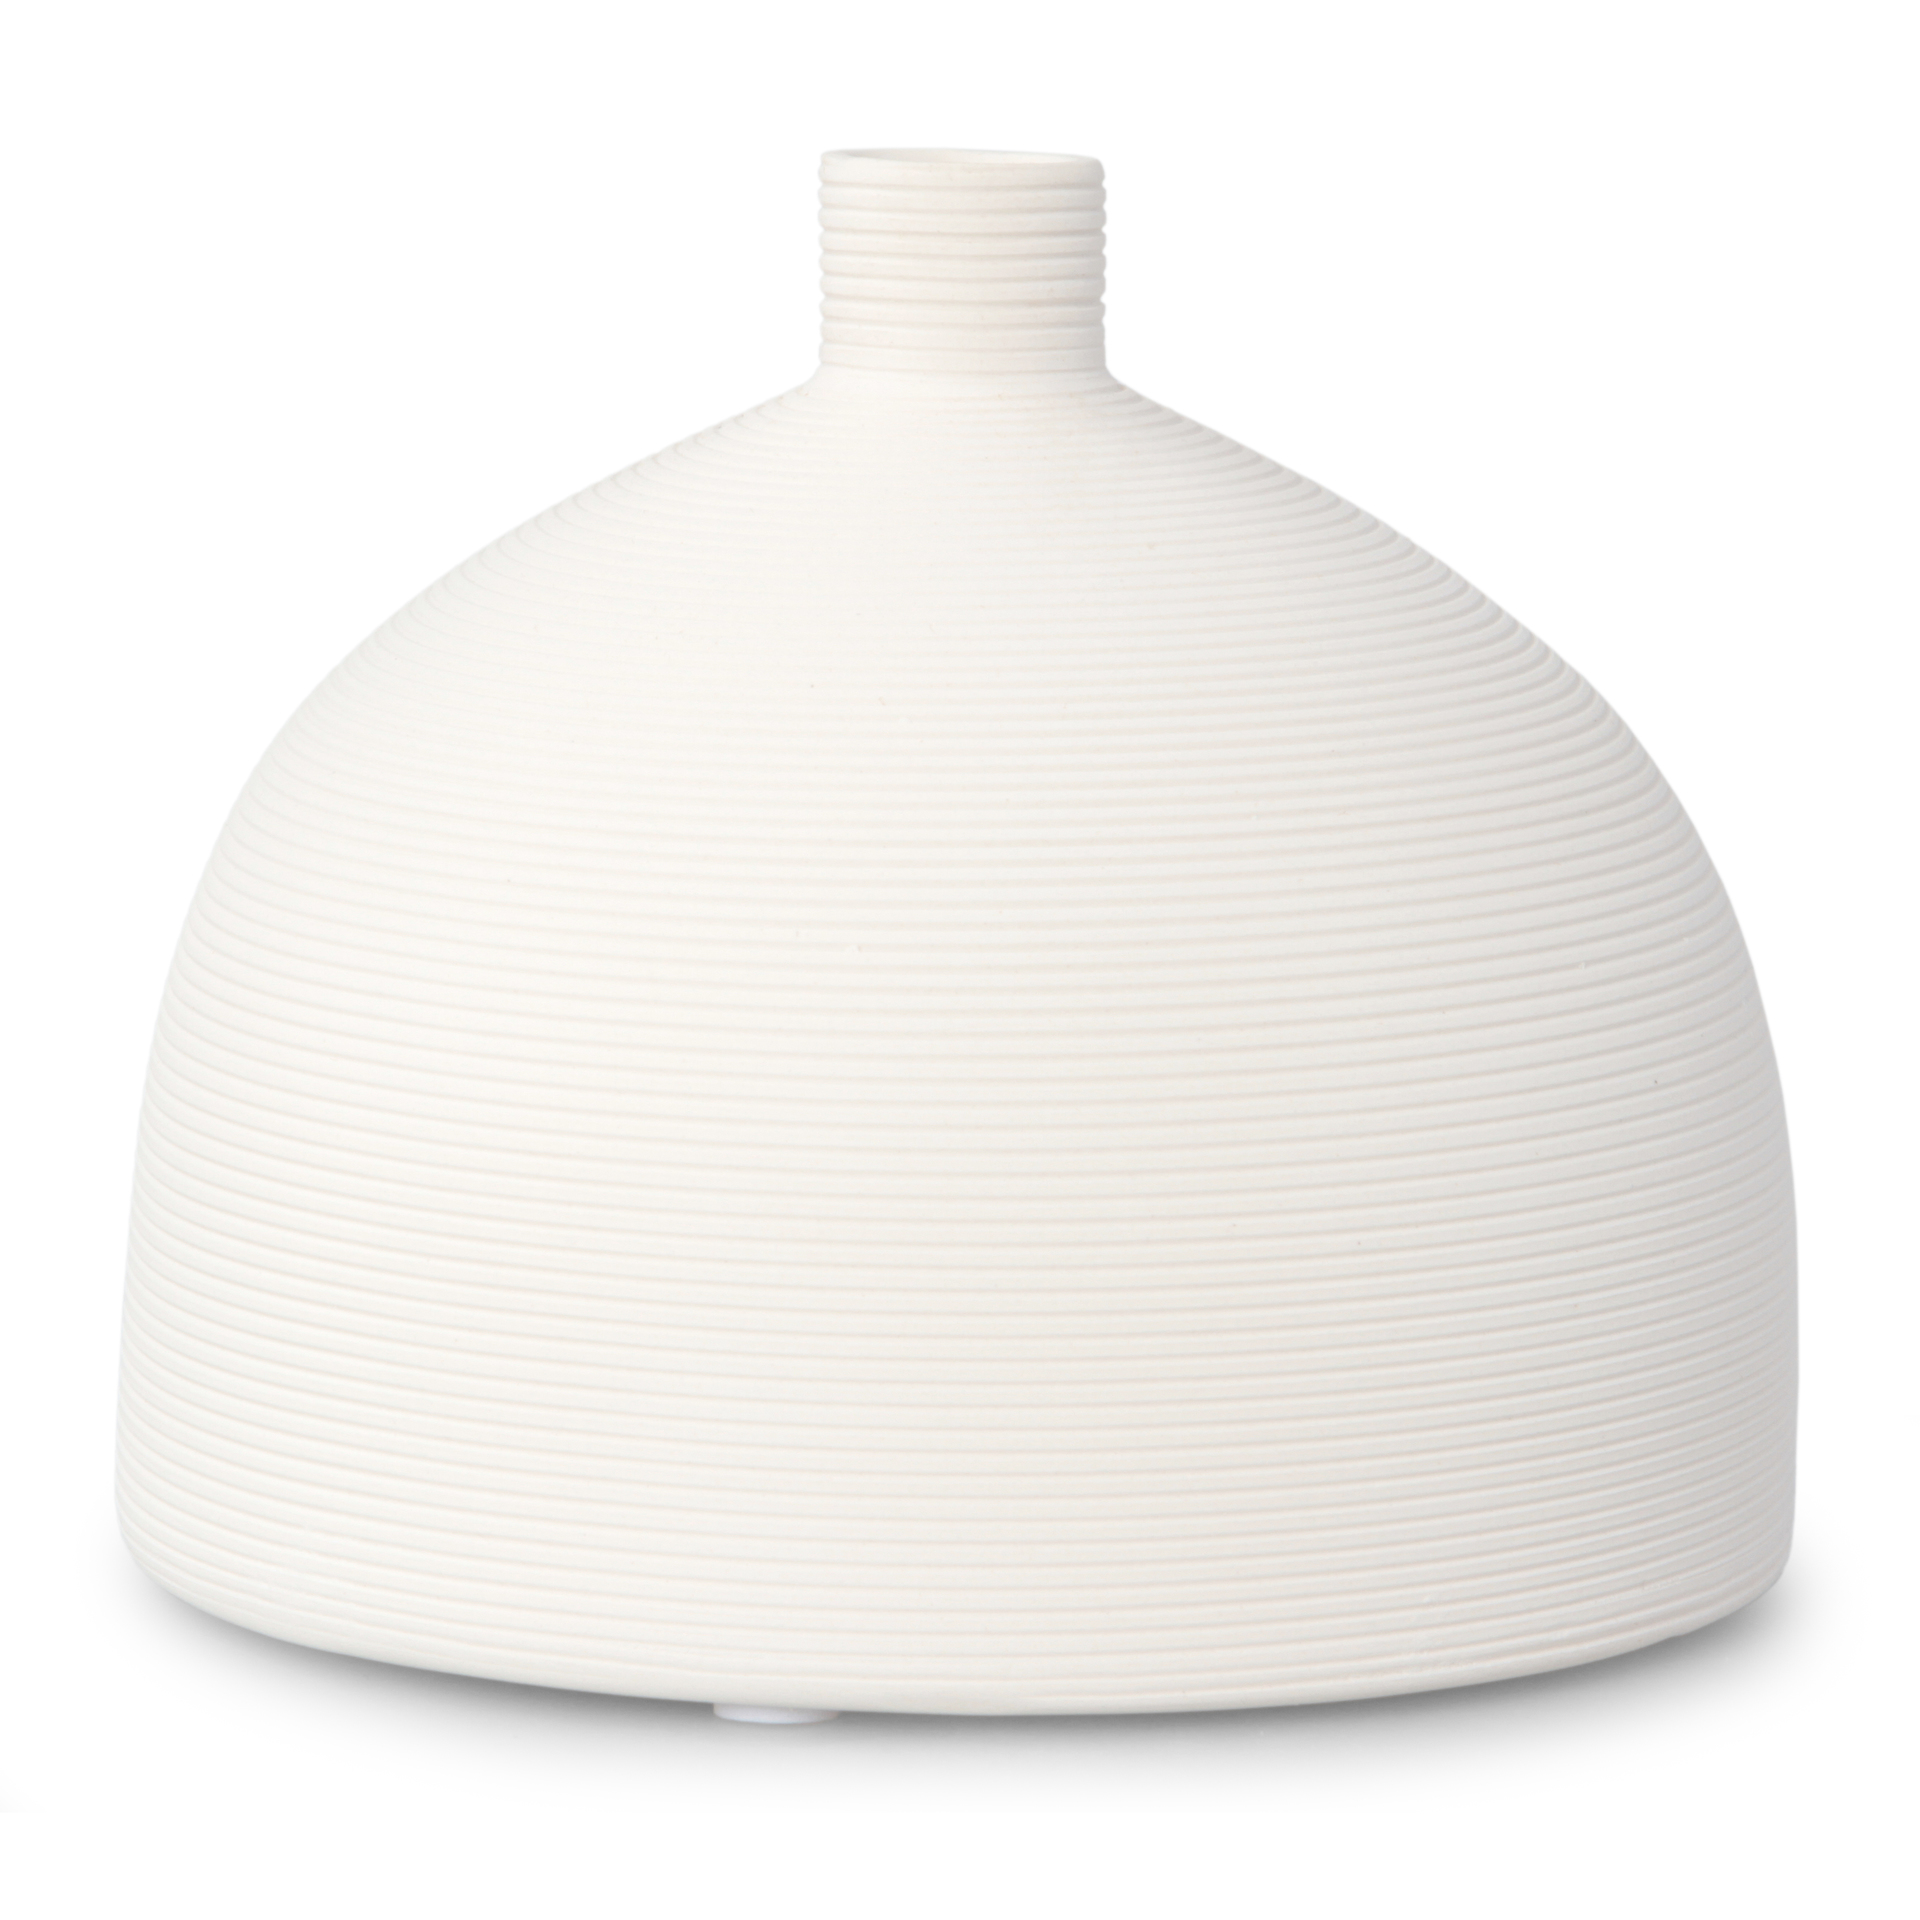 DA89151-Porcelánová váza reliéfna štruktúra